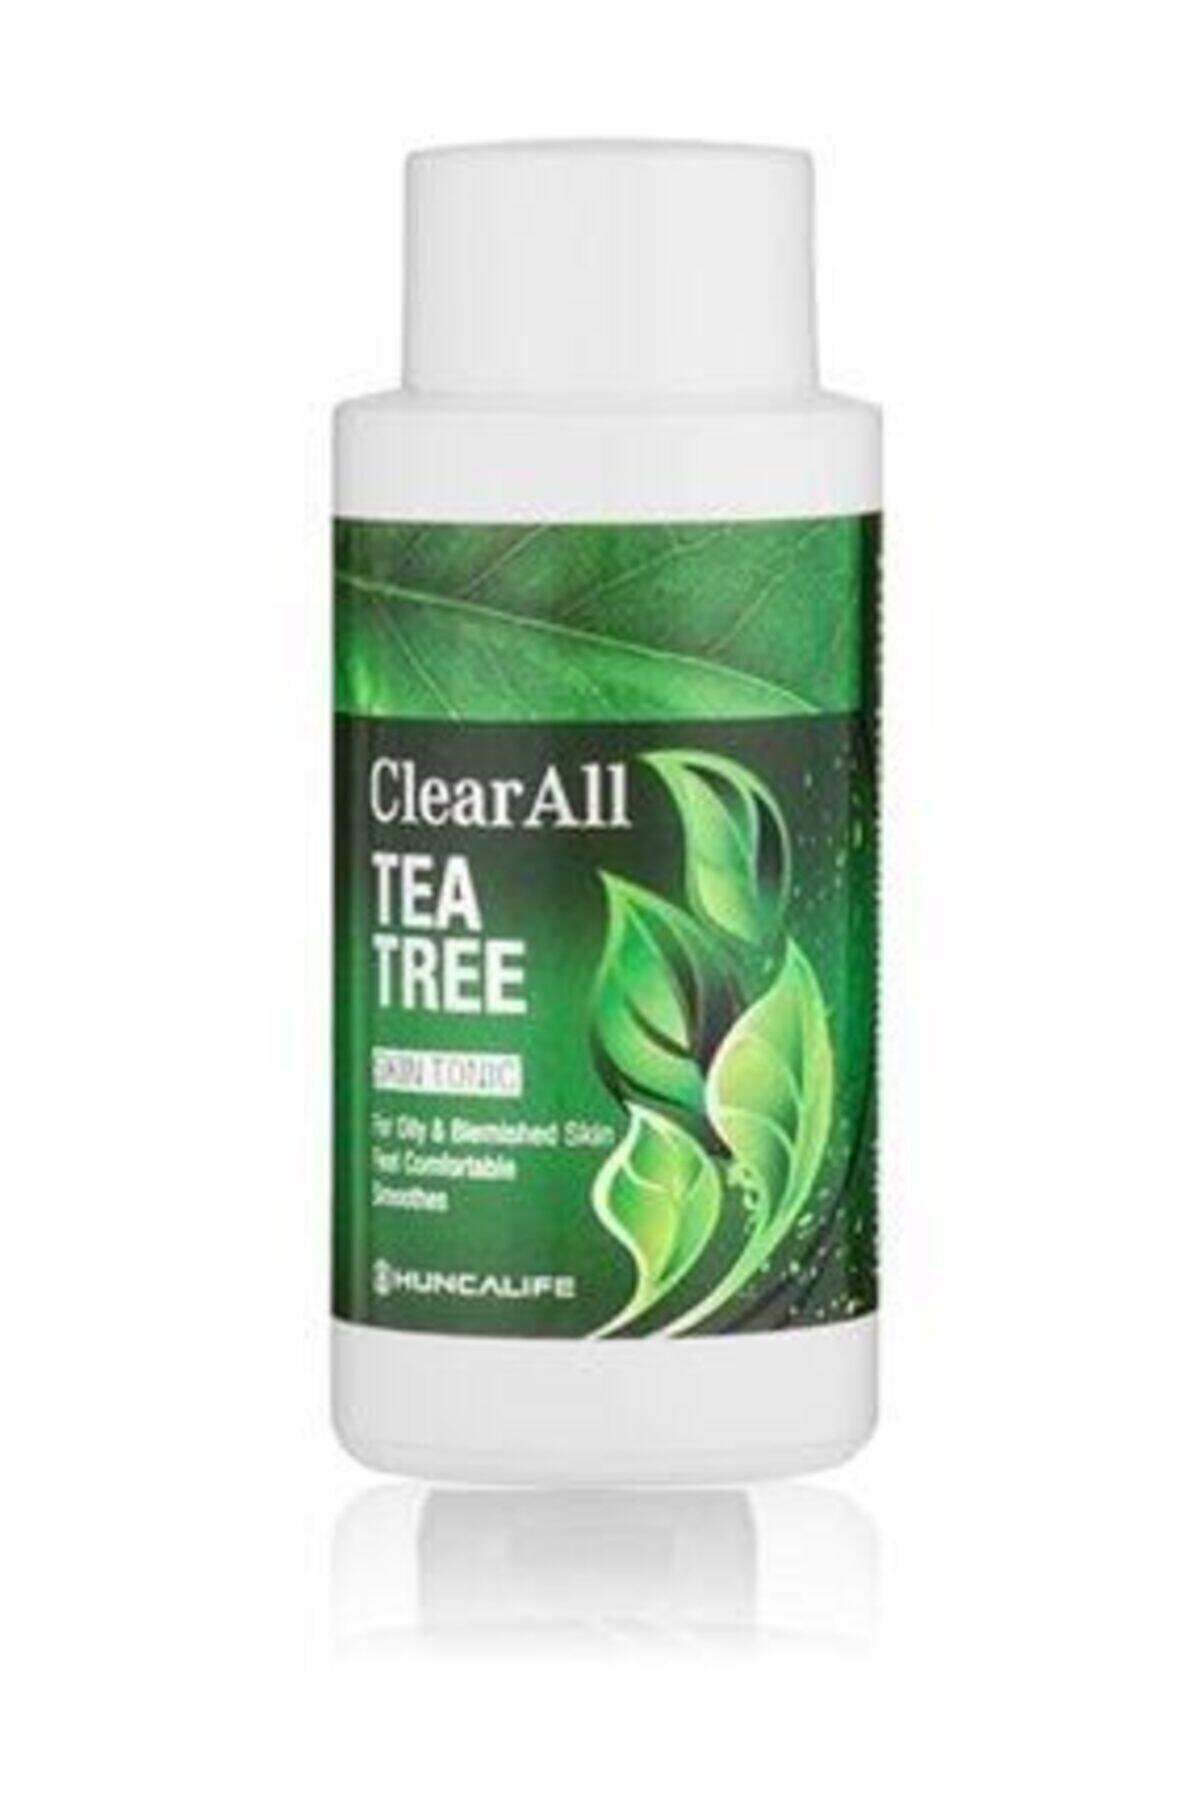 Clear All Çay Ağaçlı Tonik 150 ml 8690973719133